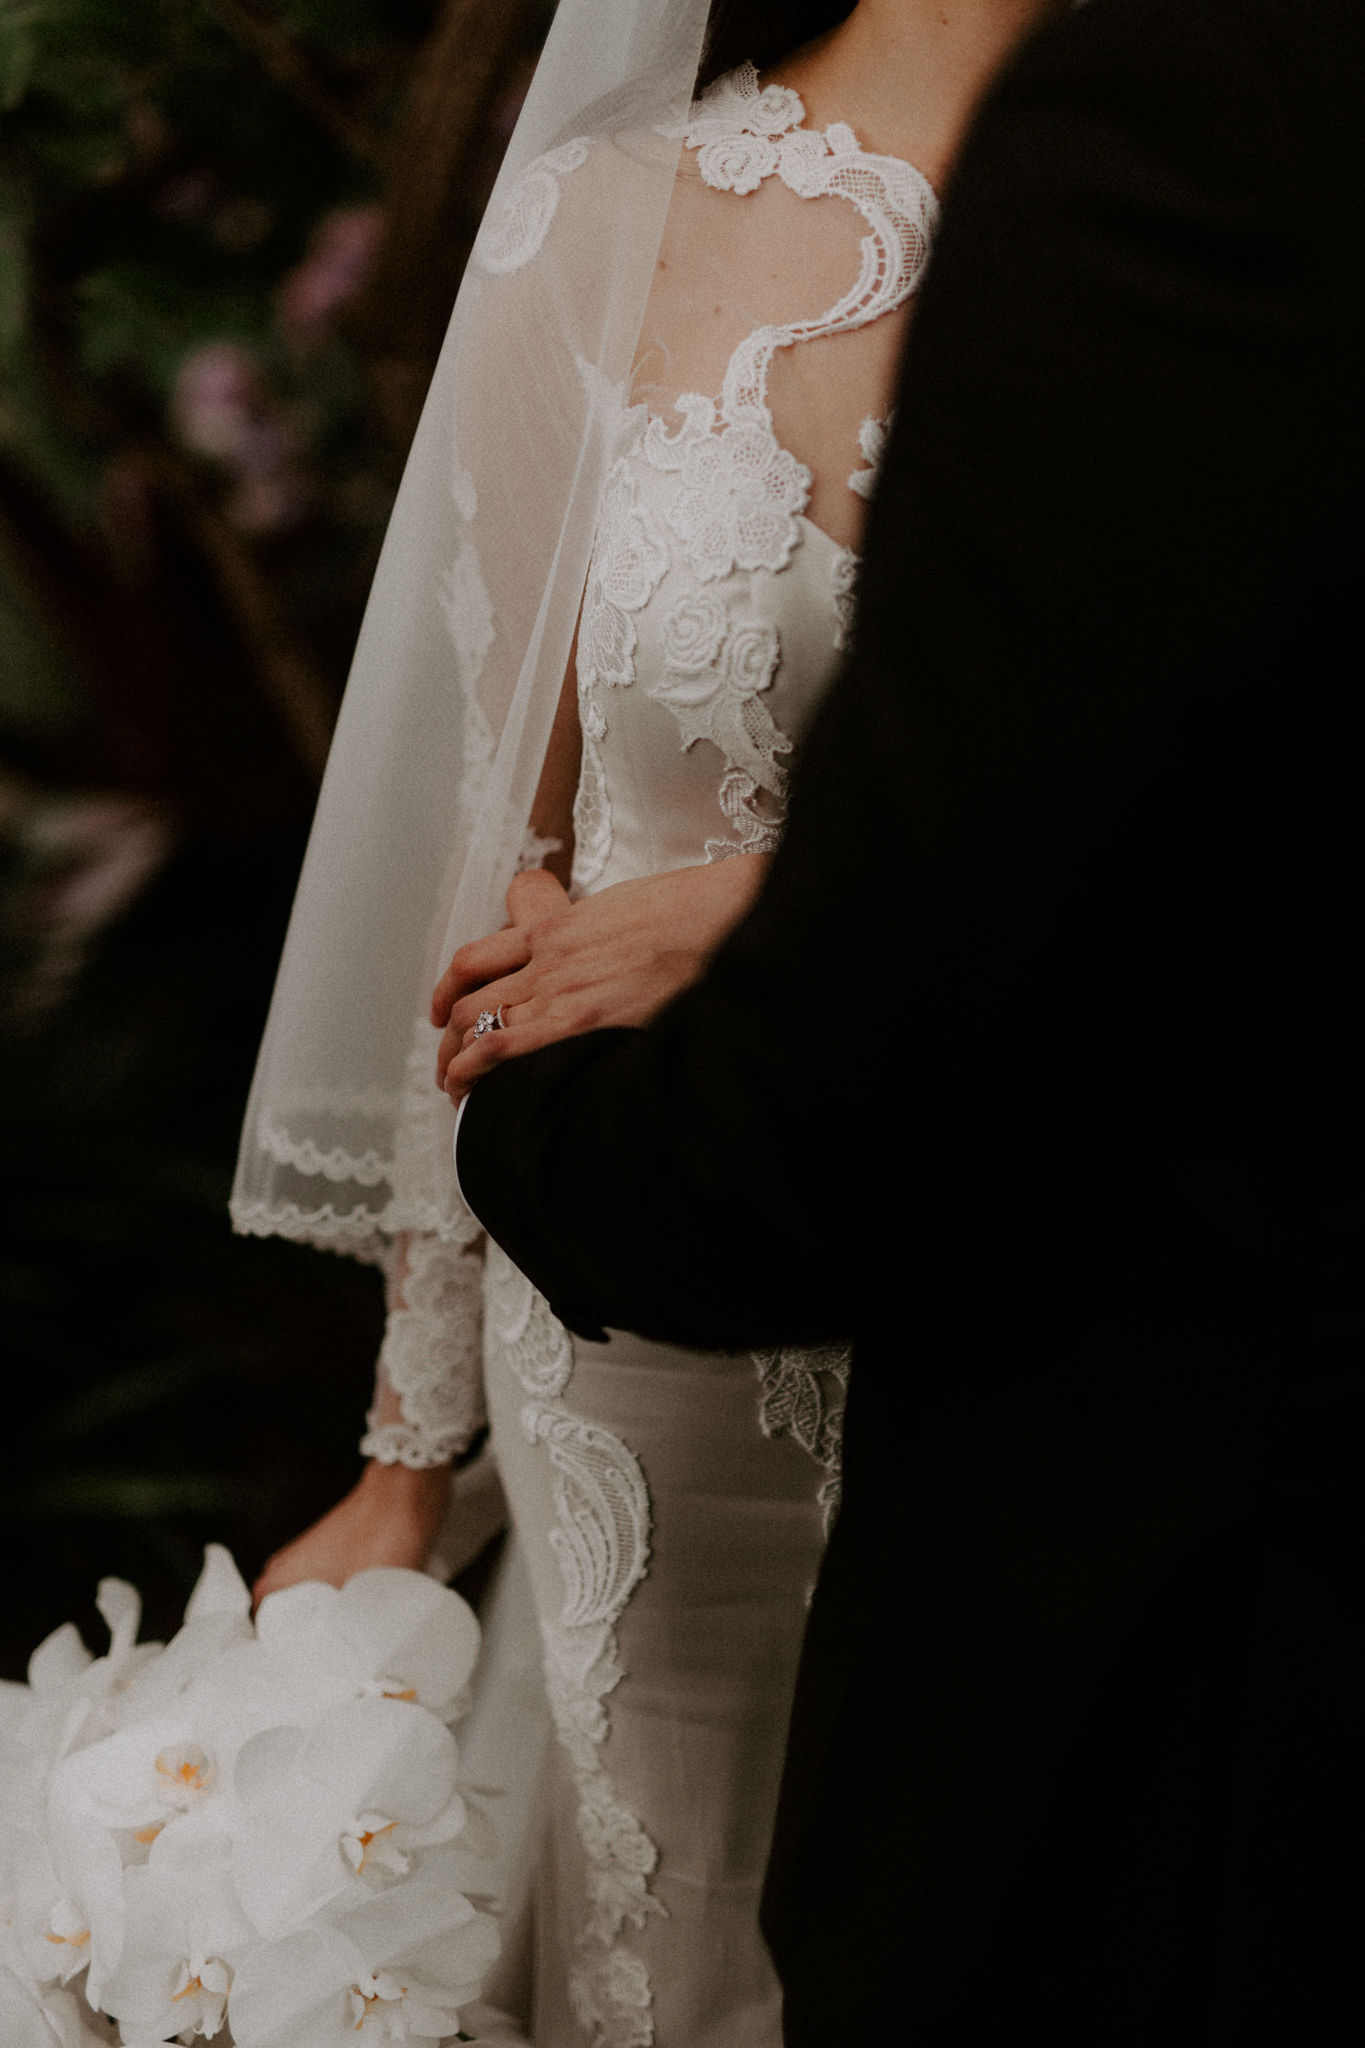 The-Terrace-Royal-Botanic-Gardens-Wedding-Emotions-and-Math-Photography-102.jpg